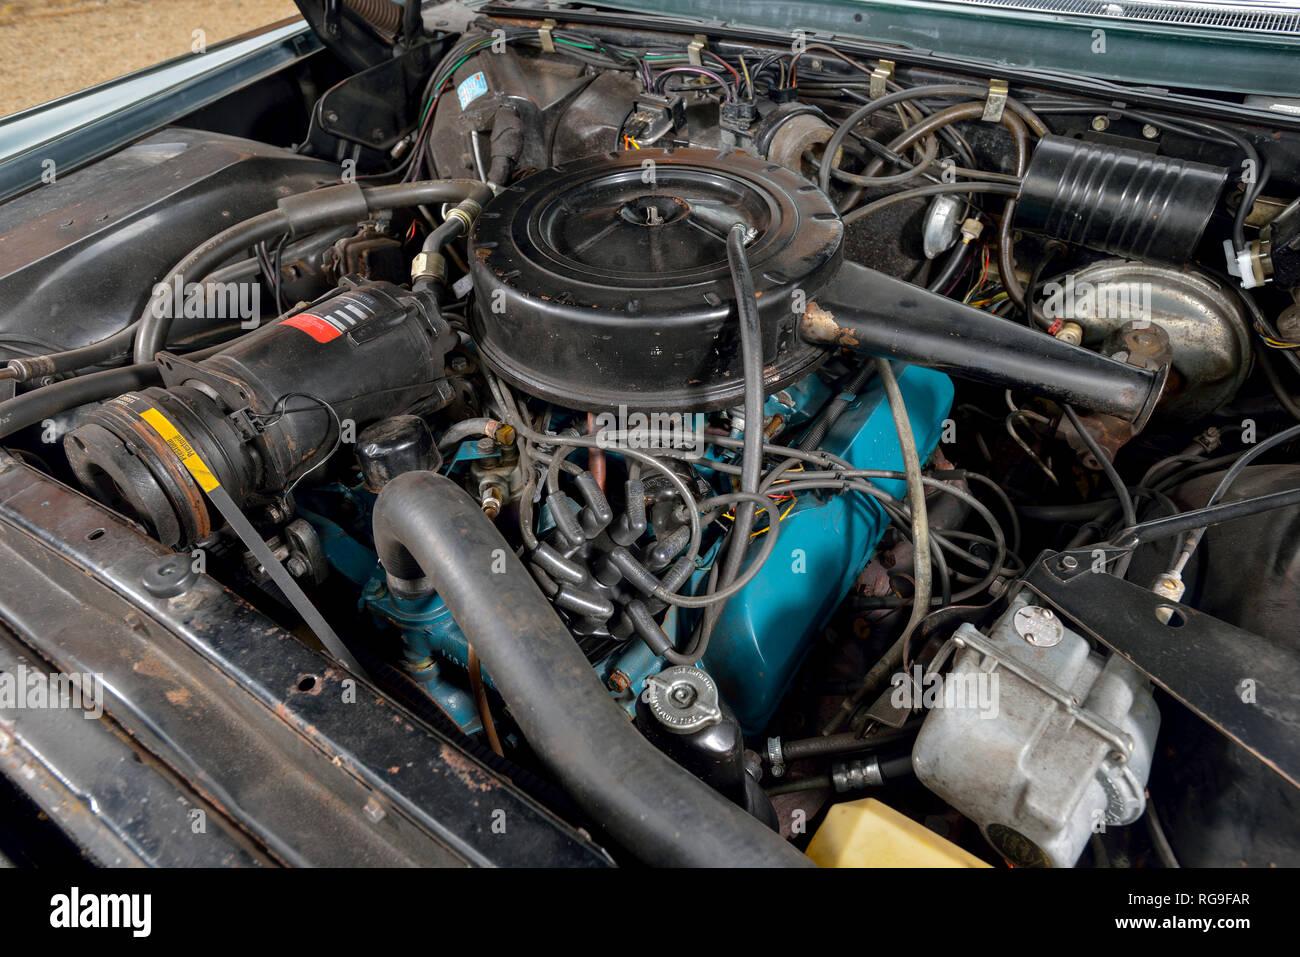 1966 Cadillac Eldorado convertible - classic American car